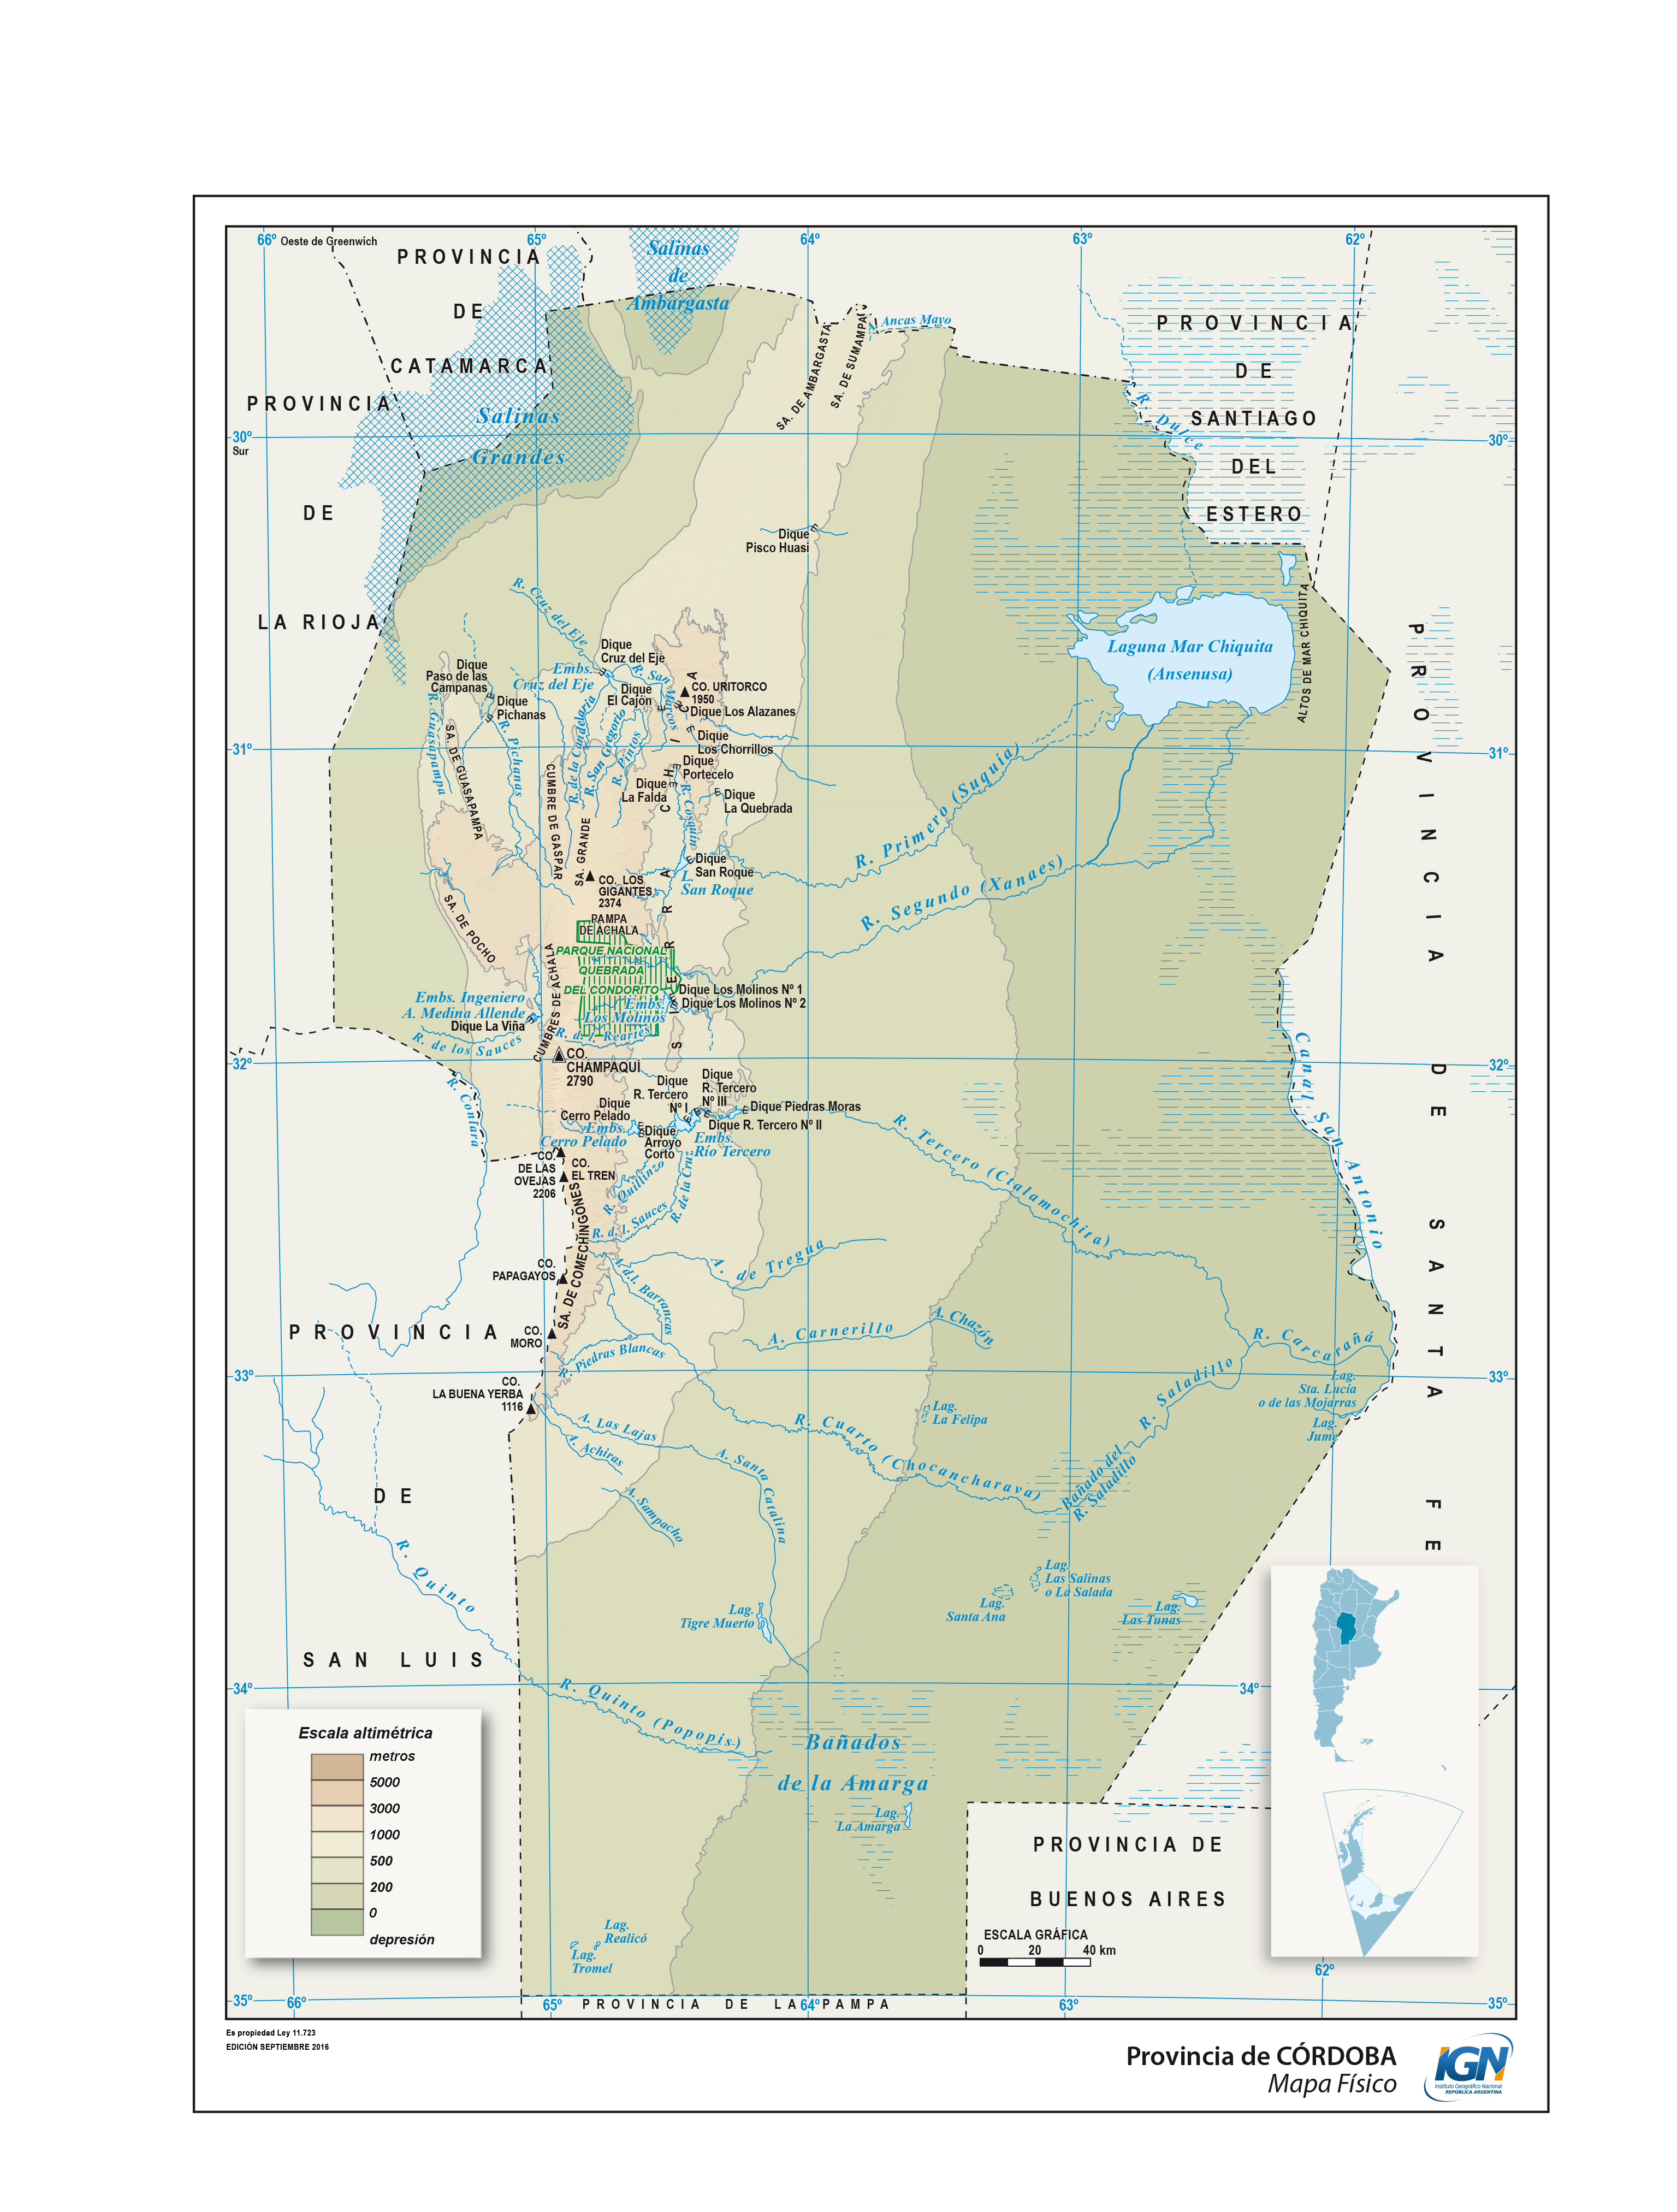 Mapa Provincia De Cordoba Politico.Mapa Fisico Provincia De Cordoba Epicentro Geografico